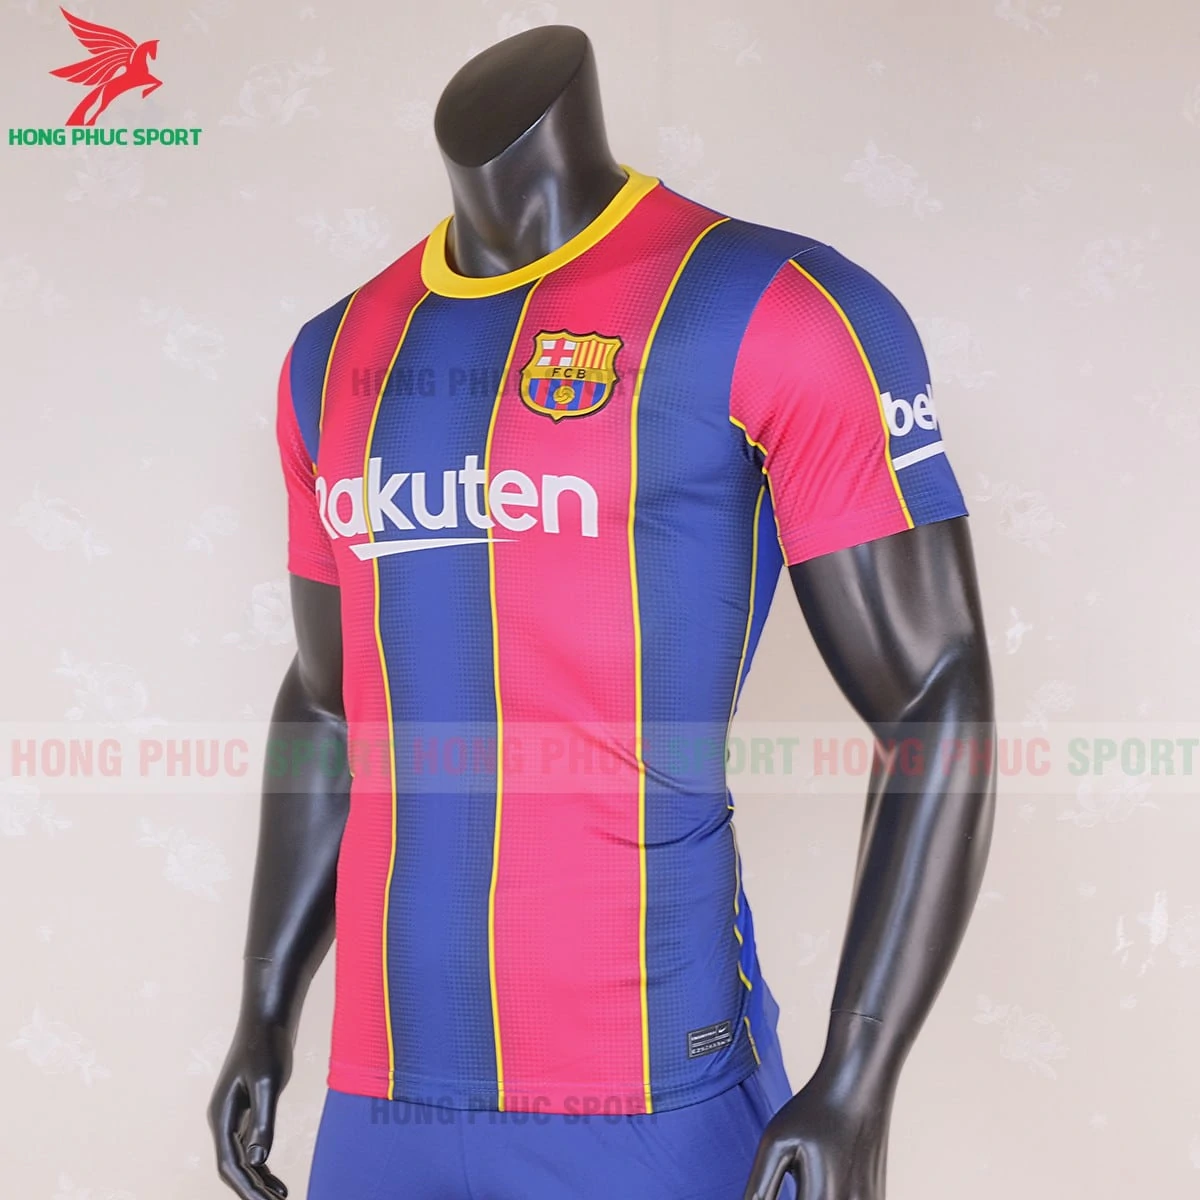 https://cdn.hongphucsport.com/unsafe/s4.shopbay.vn/files/285/ao-barcelona-2020-san-nha-hang-thailand-5-5f7305c377121.png